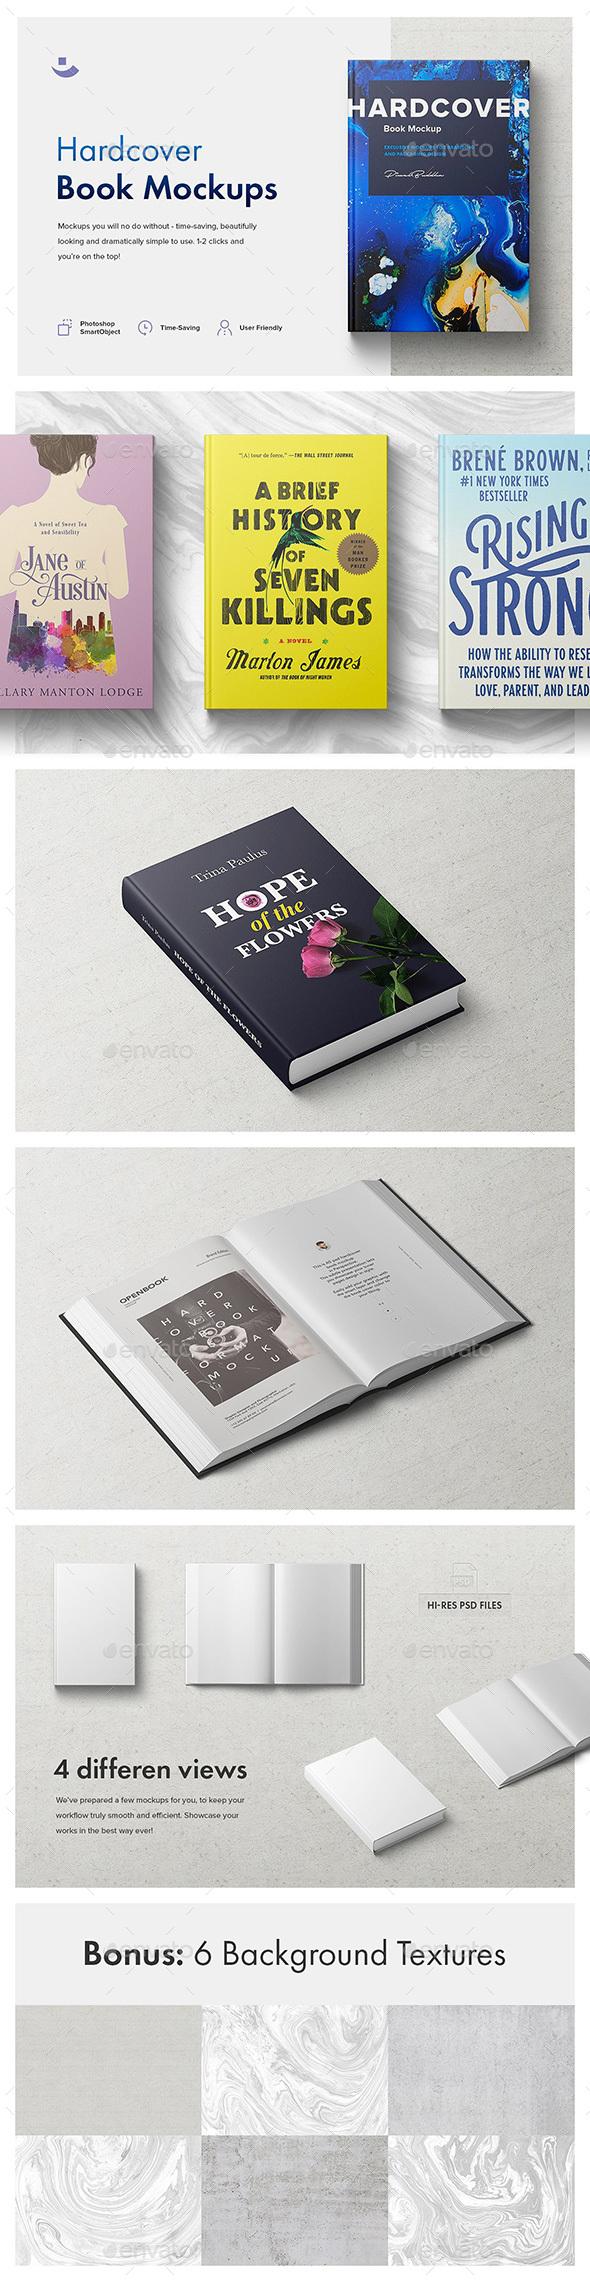 Hardcover Book Mockup Set - Books Print